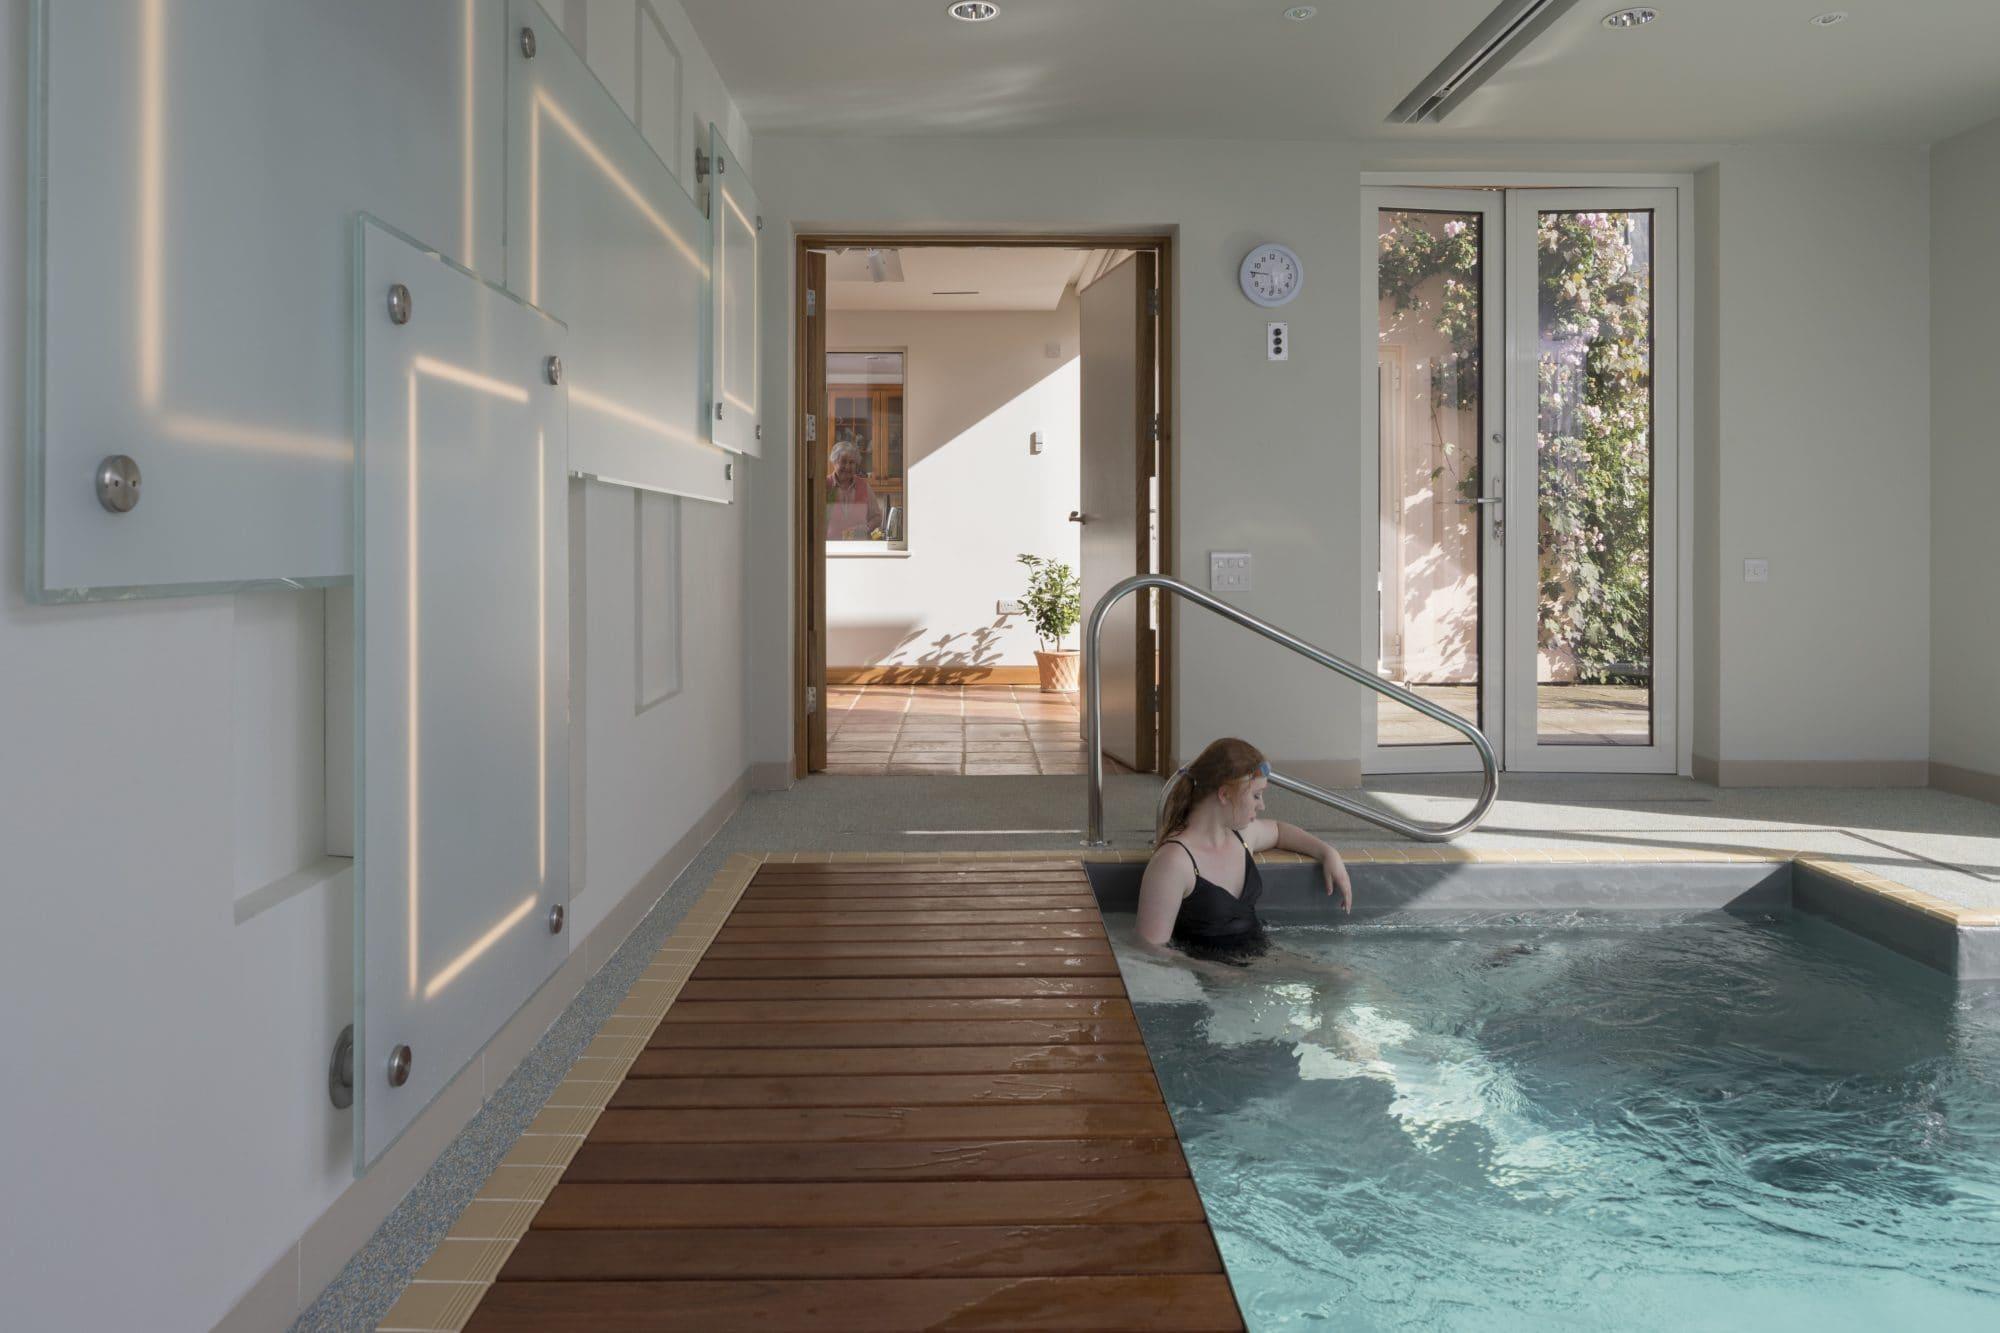 Wooden walkway alongside indoor swimming pool